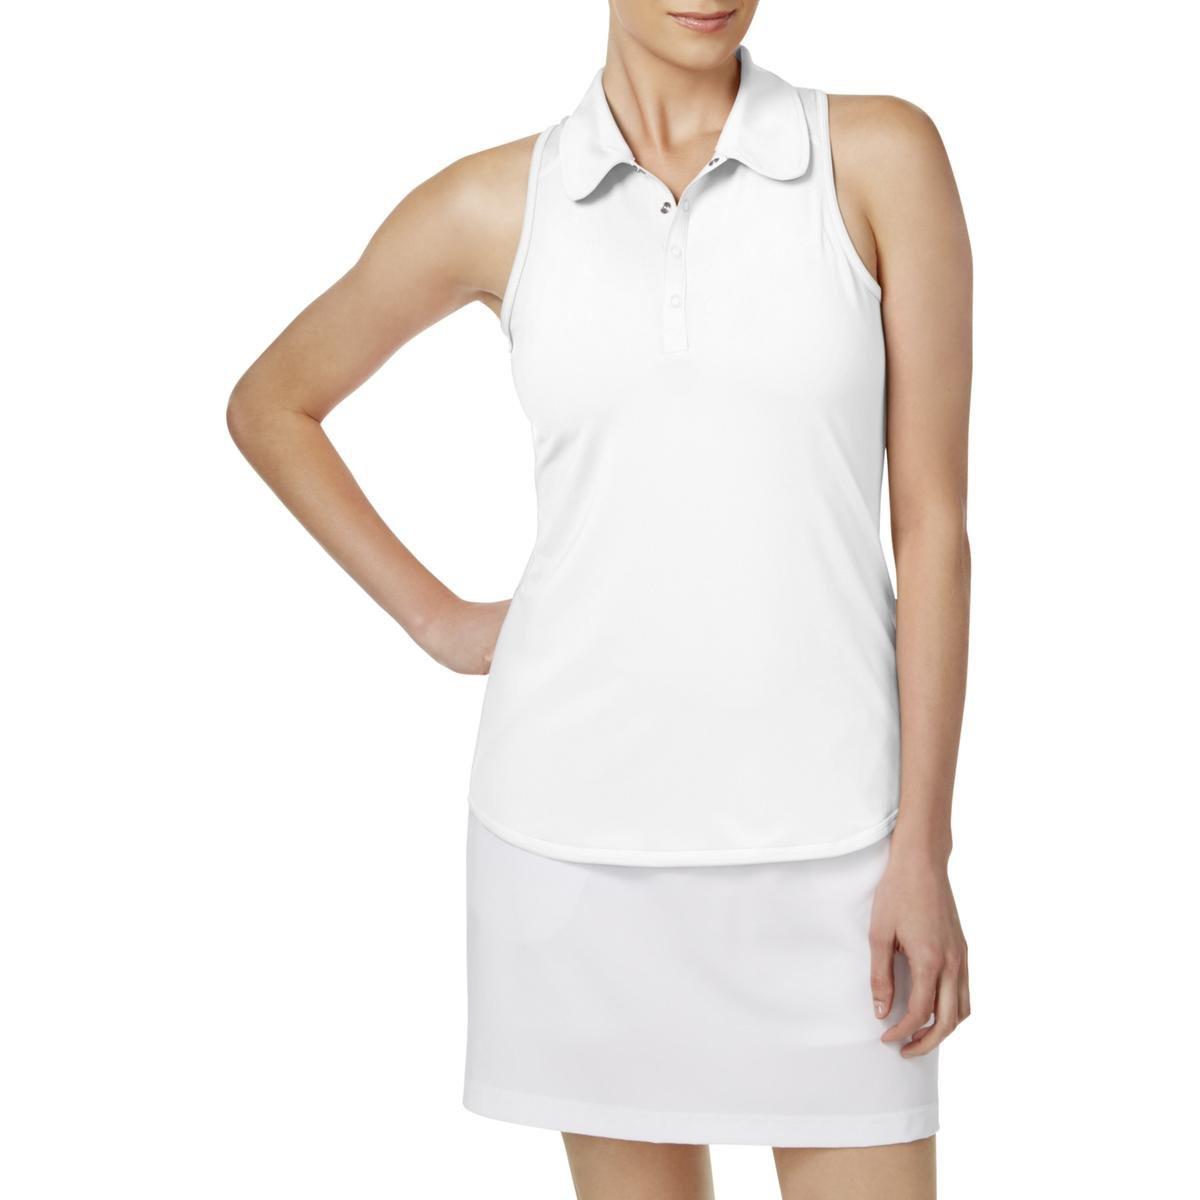 Ideology Womens Sleeveless Golf Polo White S